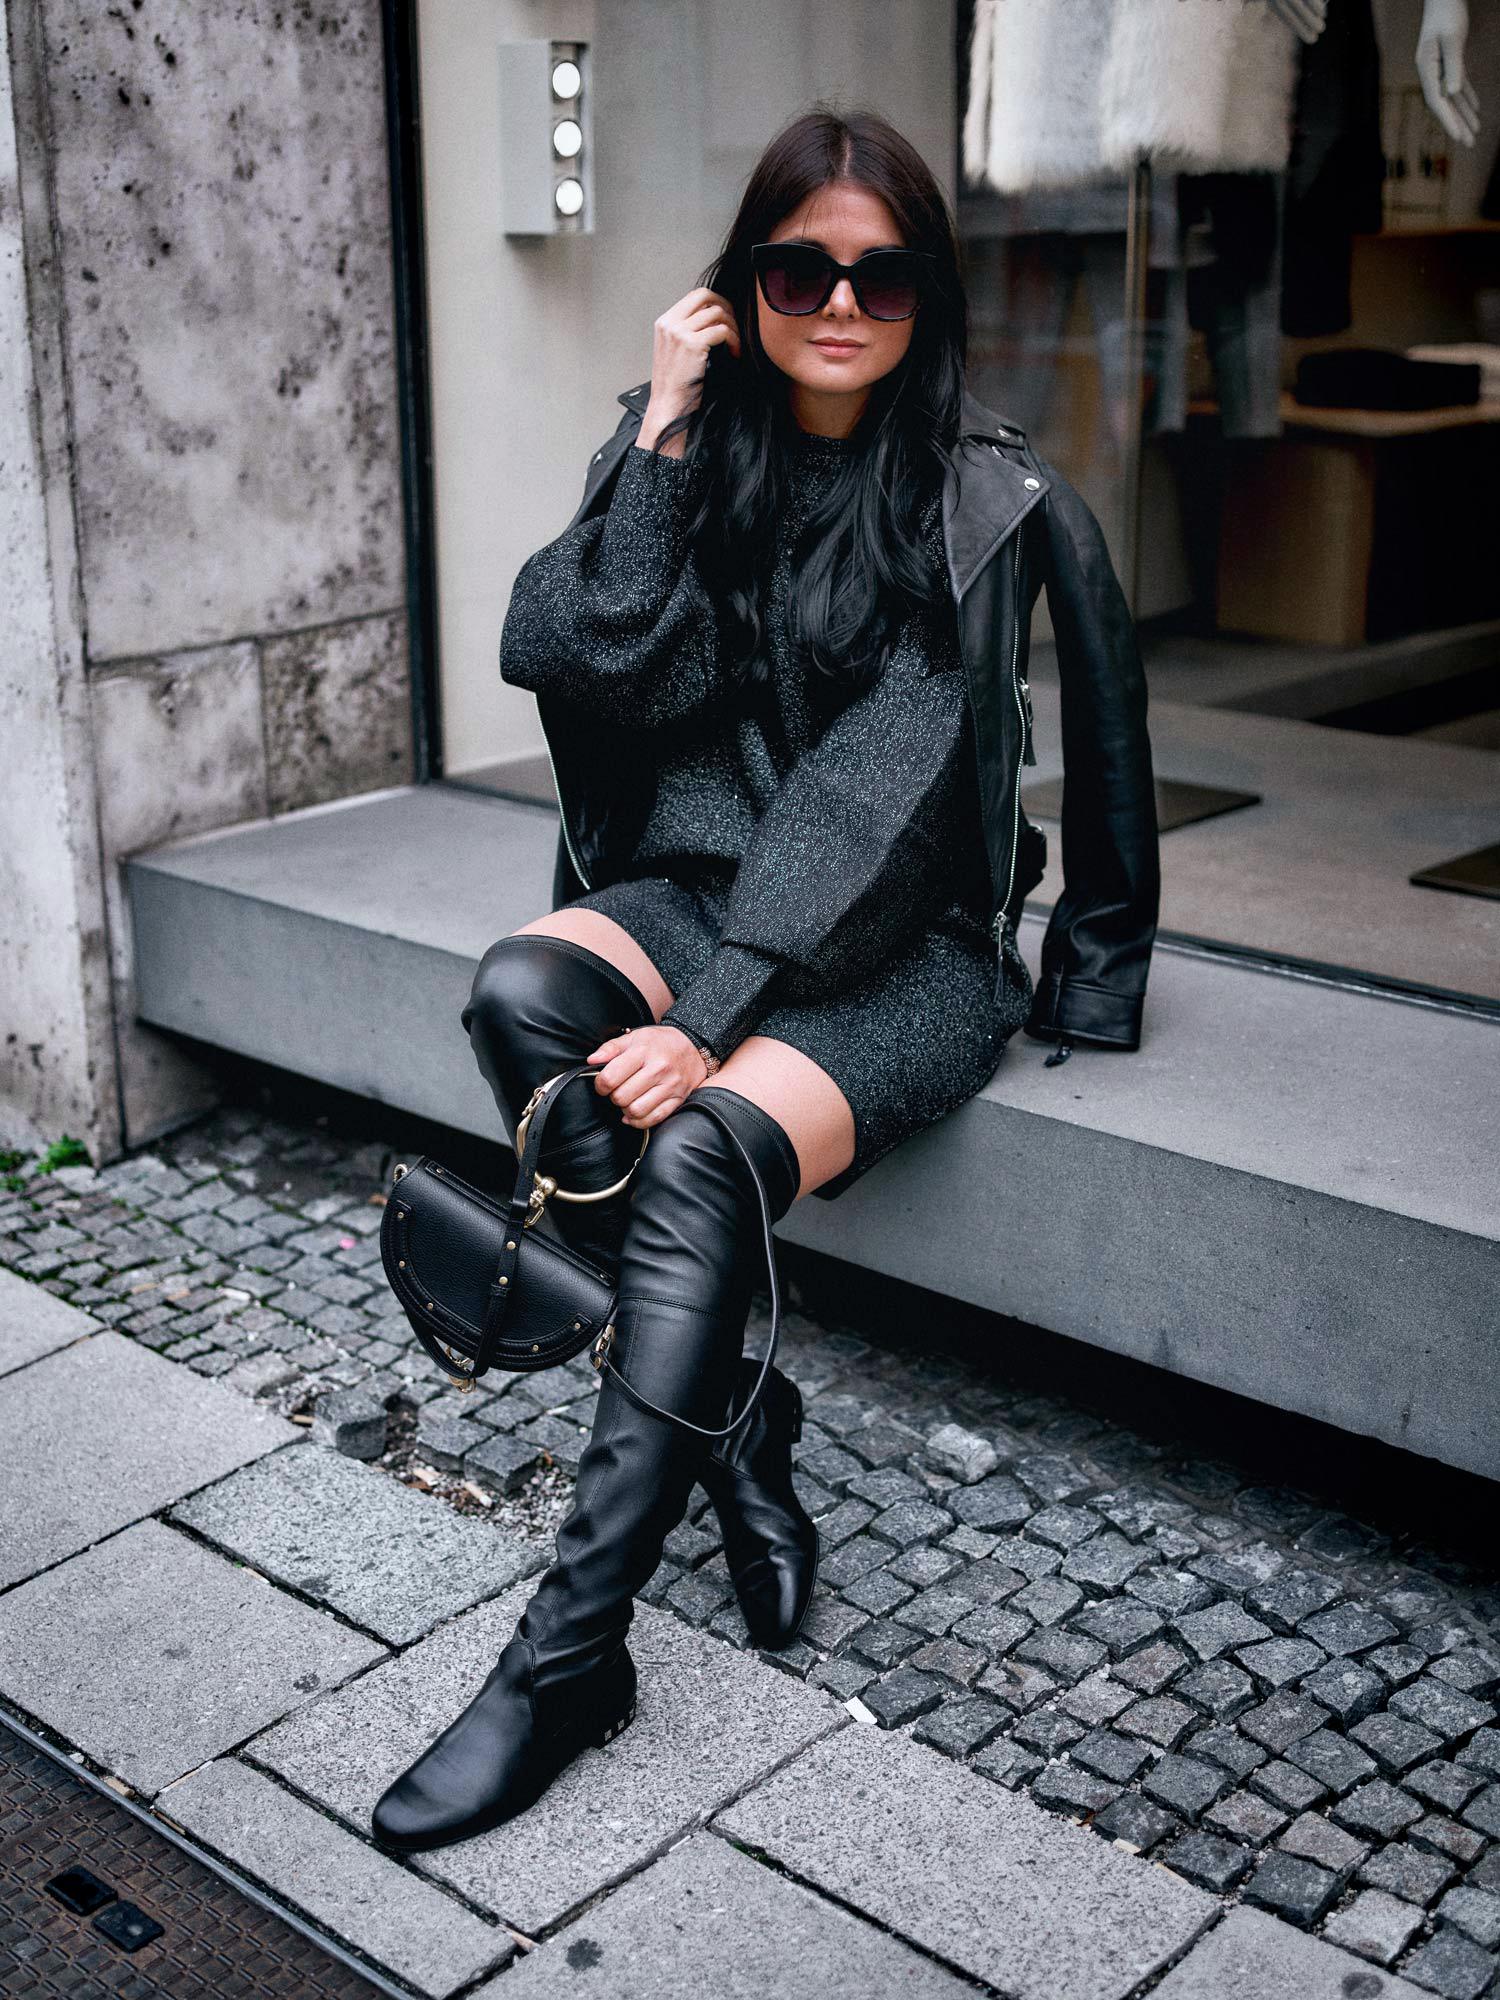 bloggerdeutschland-fashionblogger-fashion-blogger-modeblogger-modeblog-munich-blog-fashionblogger-muenchen-styling-tipps-#allblackeverything